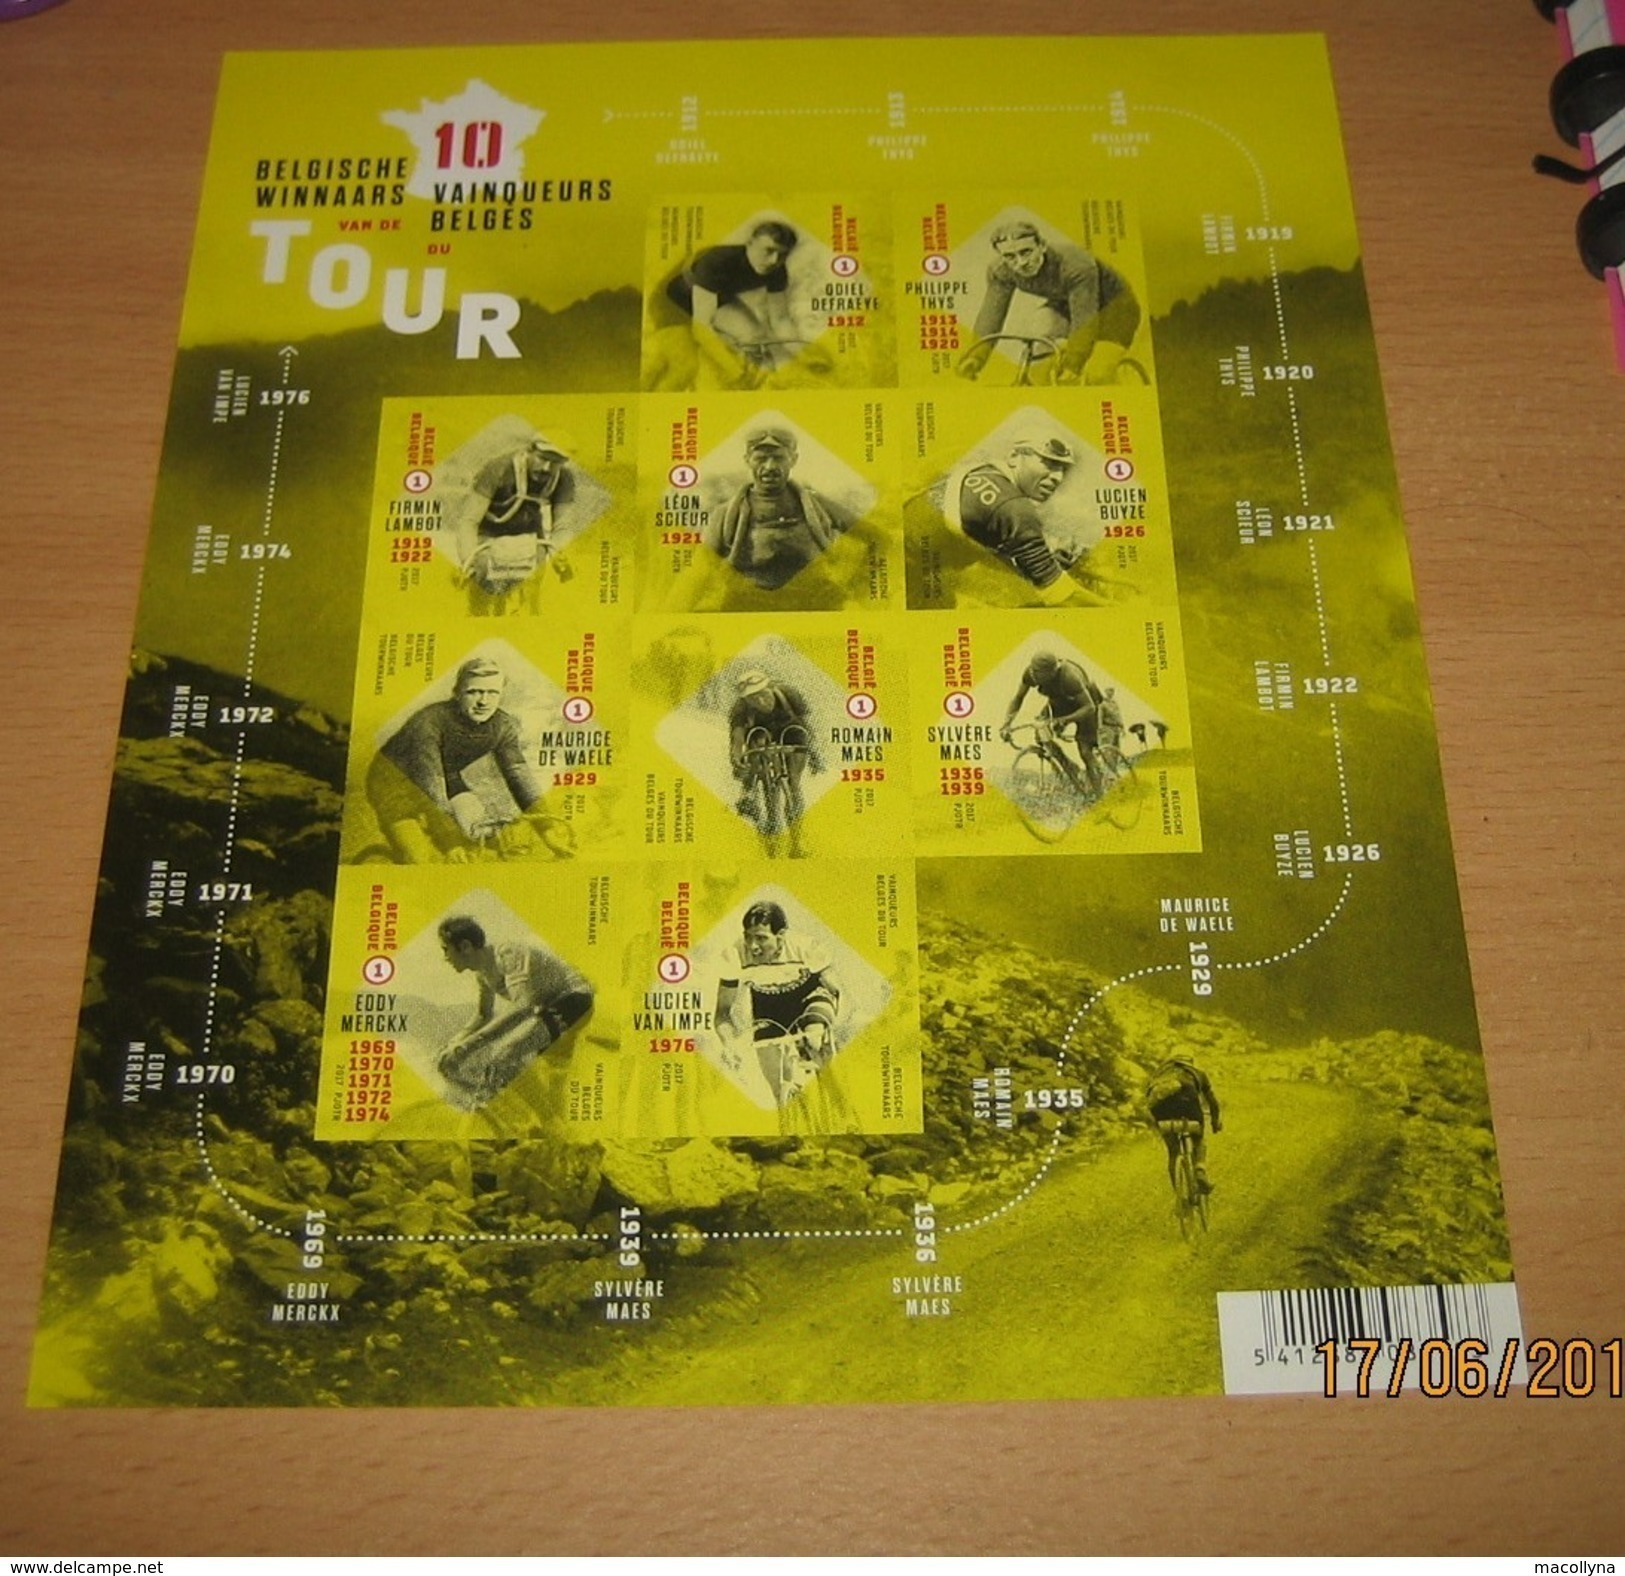 De 10 Belgische Tourwinnaars - Belg. 2017 - Les Dix Vainqueurs Belges Du Tour De France** Imperforated Sheet-Ongetand-ND - Belgium